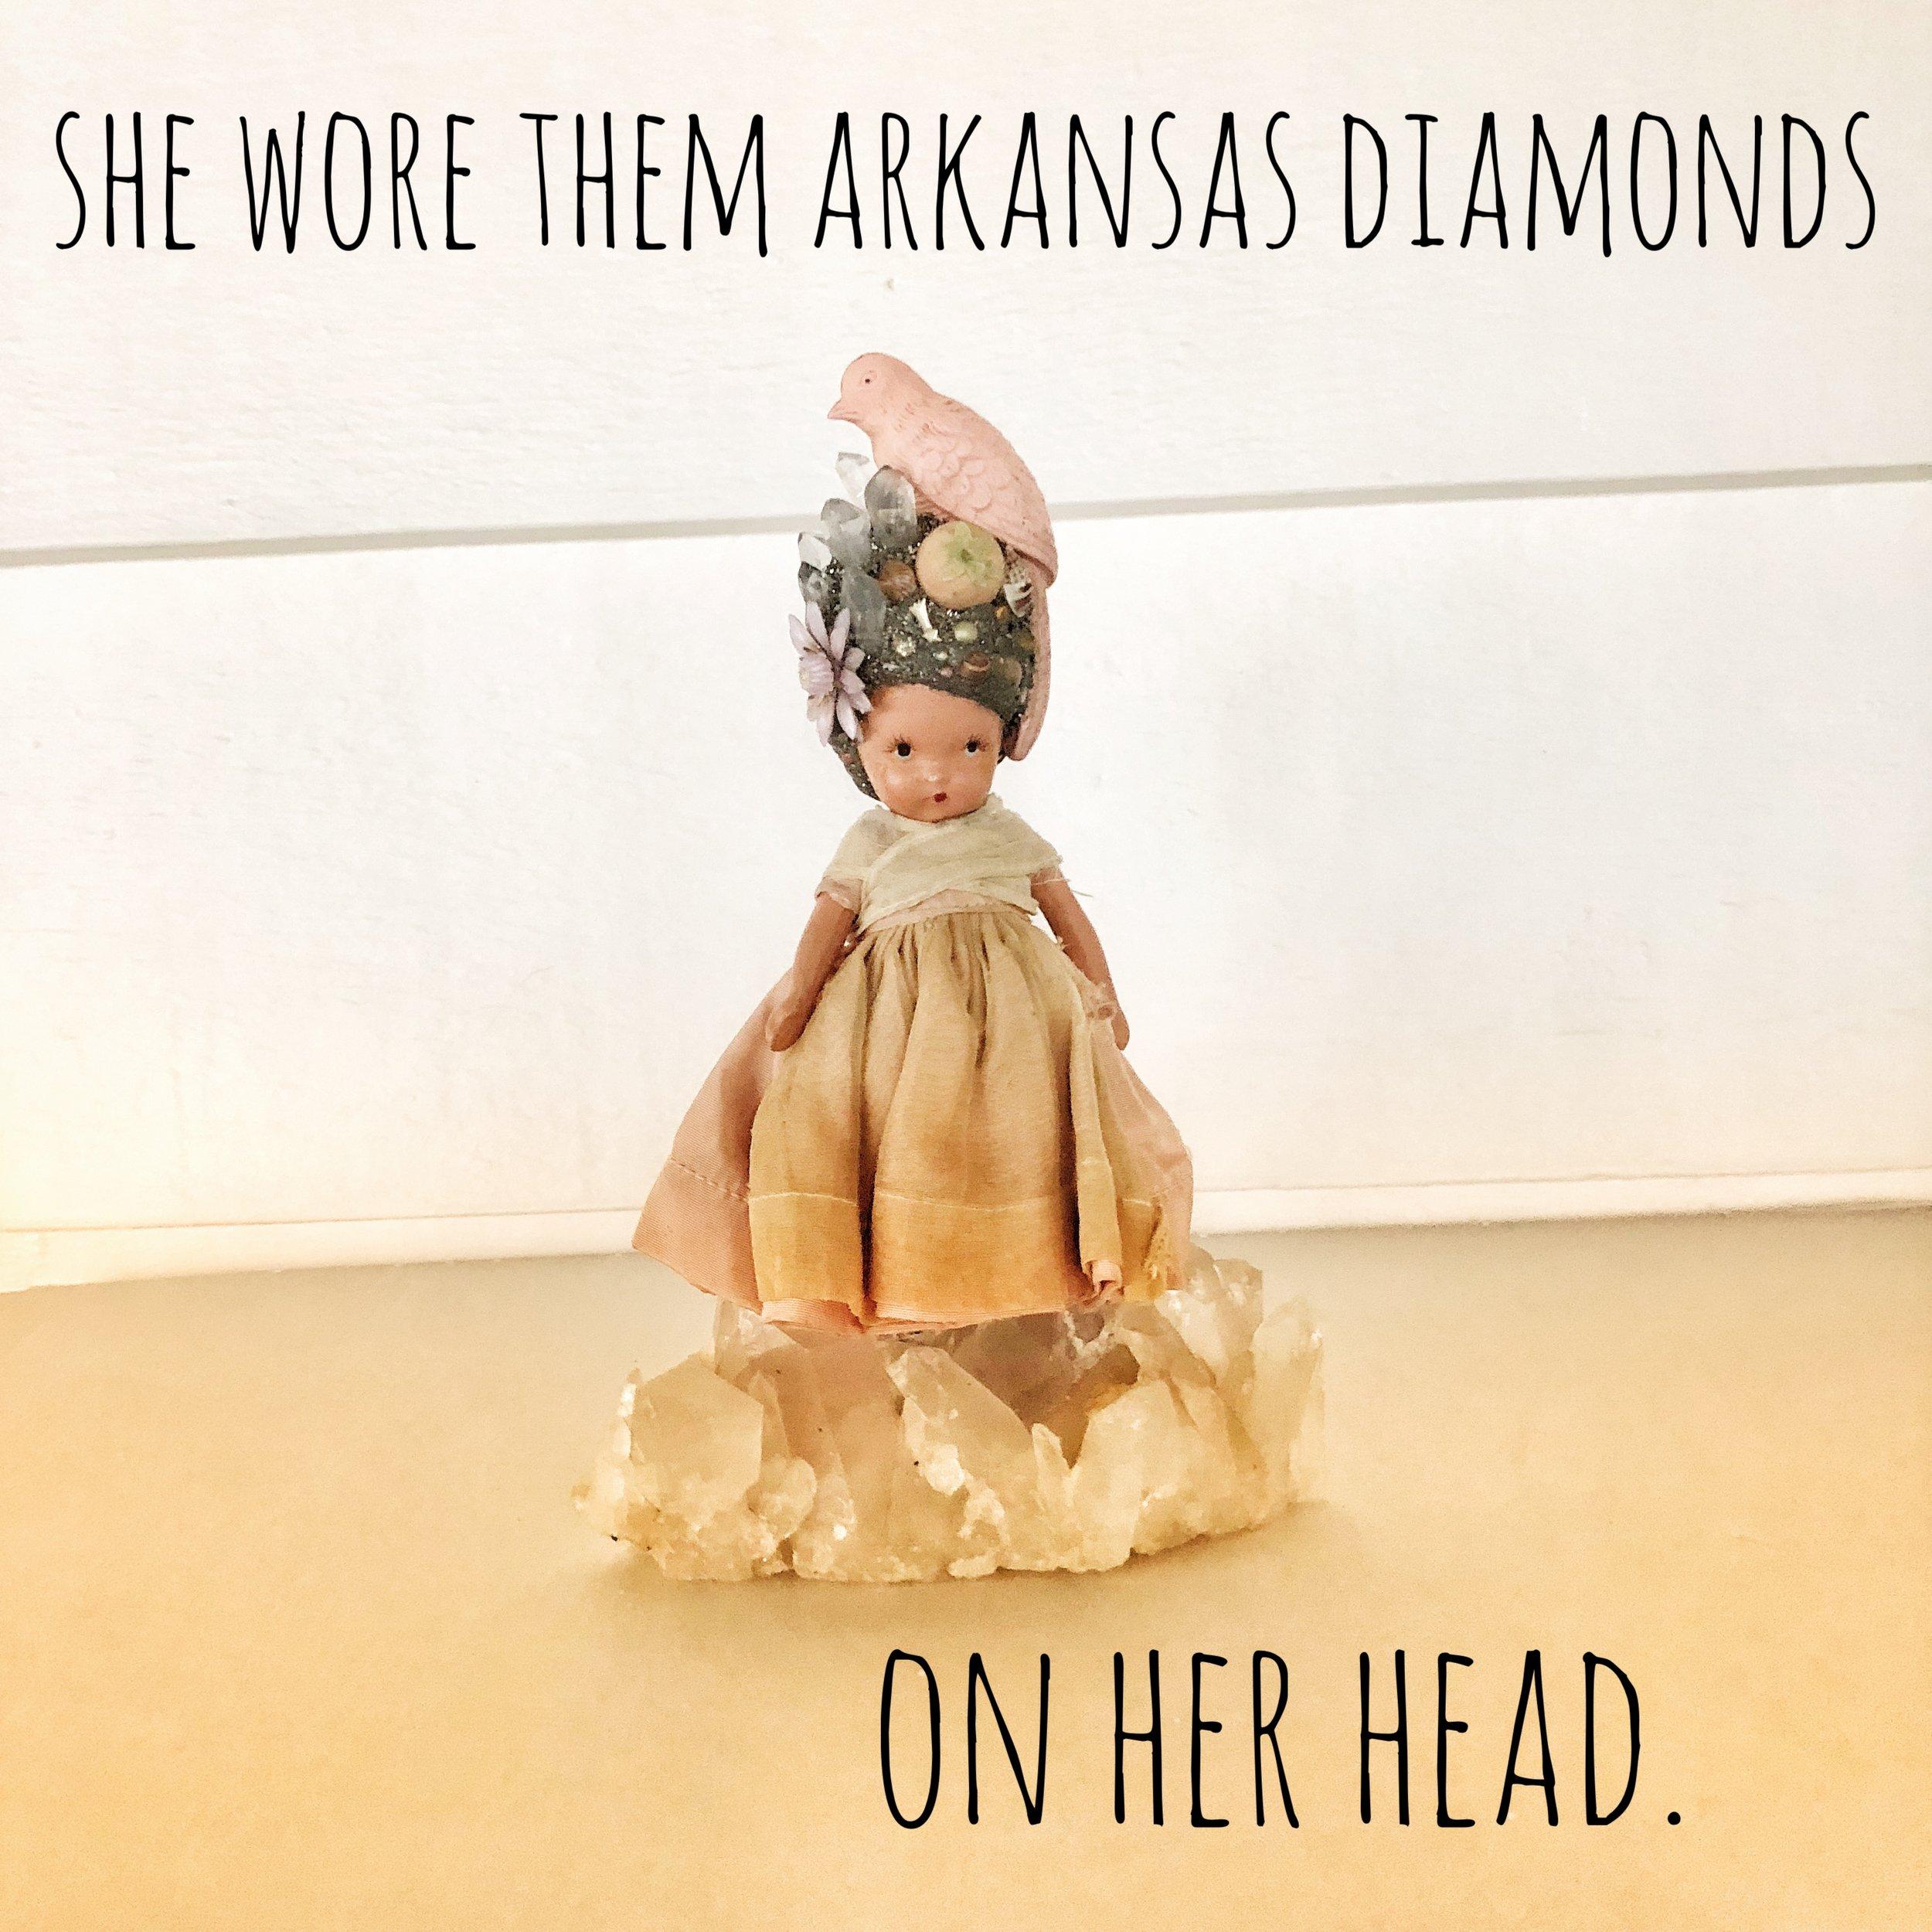 She Wore Them Arkansas Diamonds on her Head